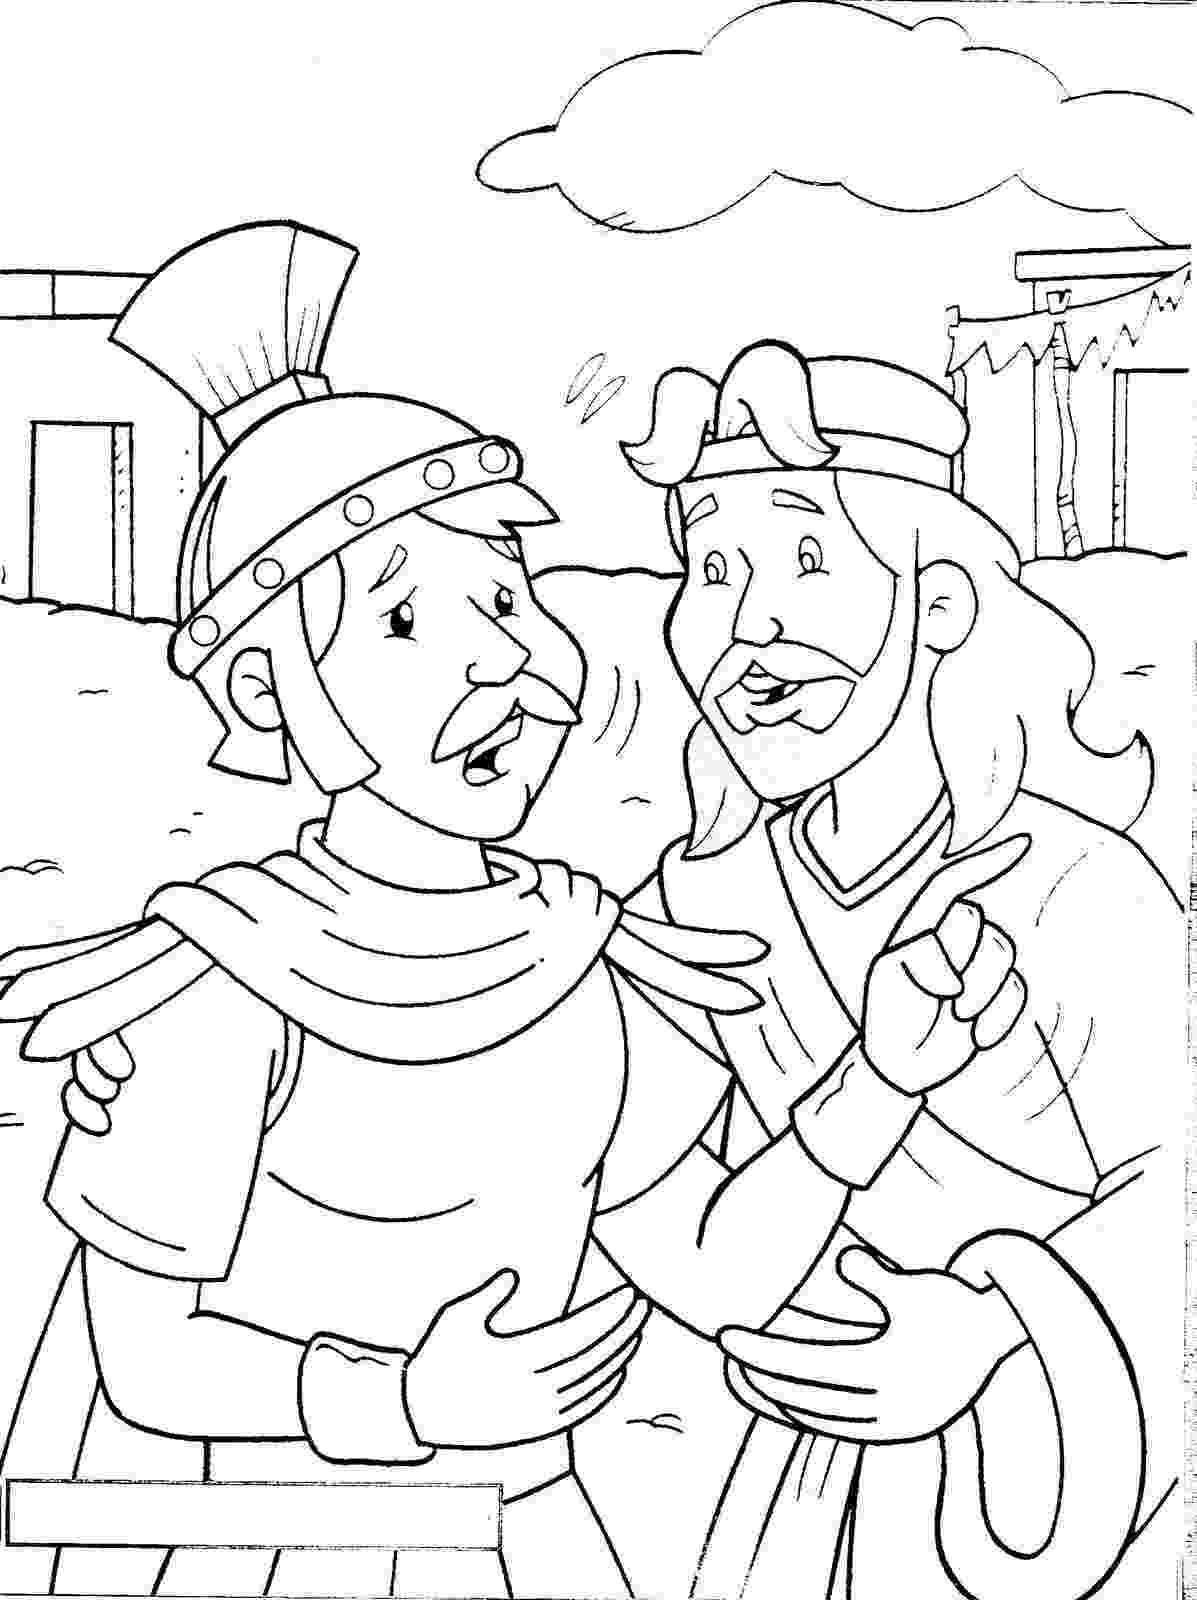 coloring pages jesus centurion coloring parabolas de jesus para colorear jesus coloring pages